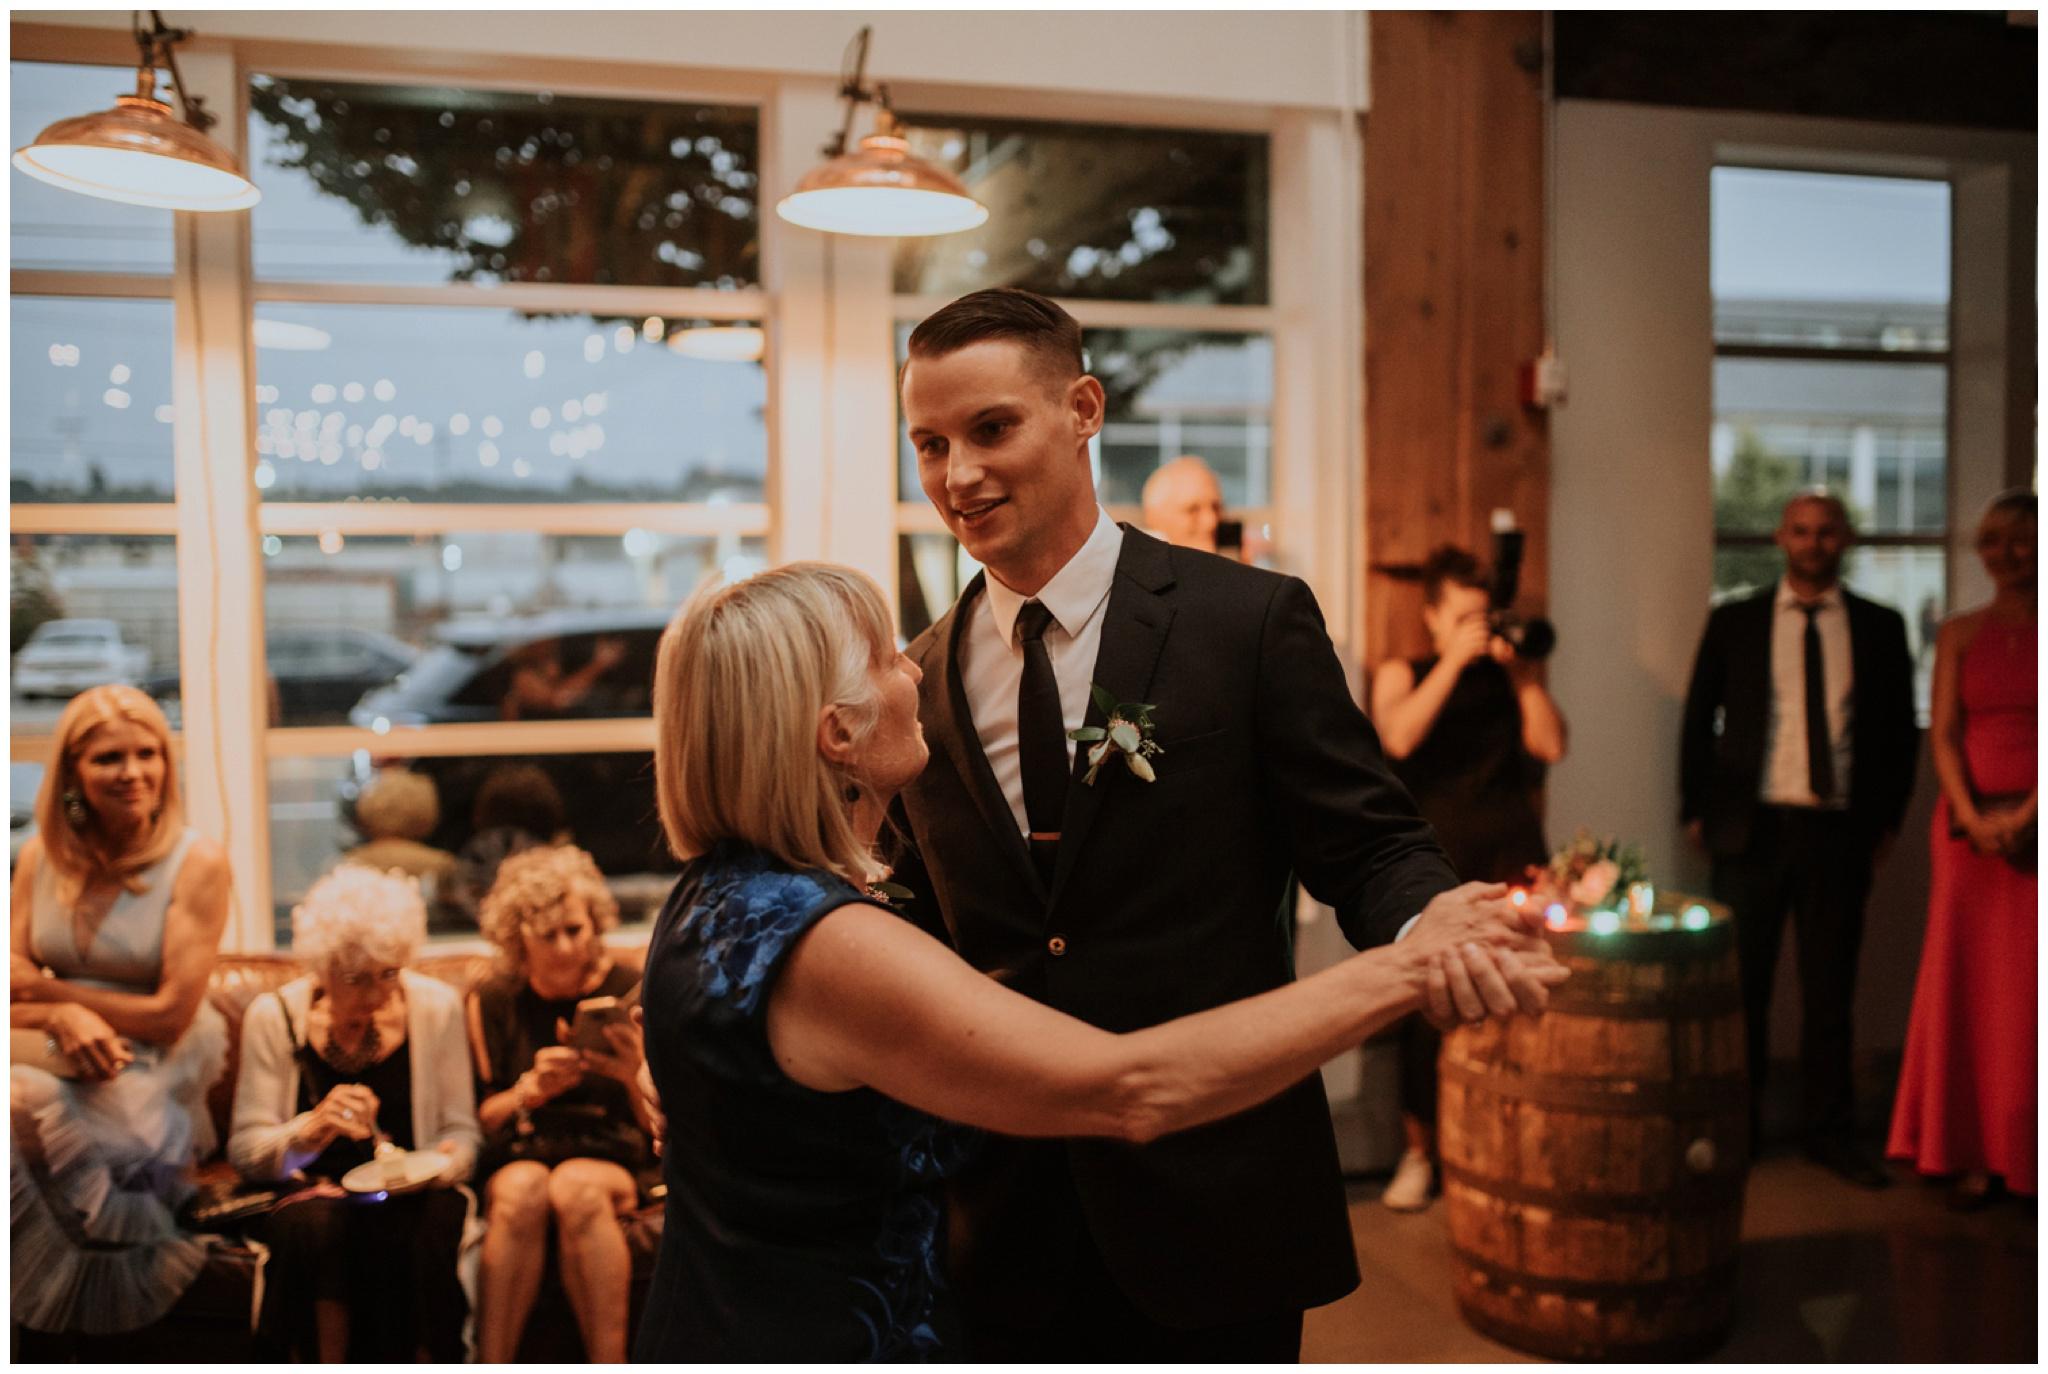 alyssa-keiran-westland-distillery-urban-seattle-wedding-photographer-caitlyn-nikula-152.jpg